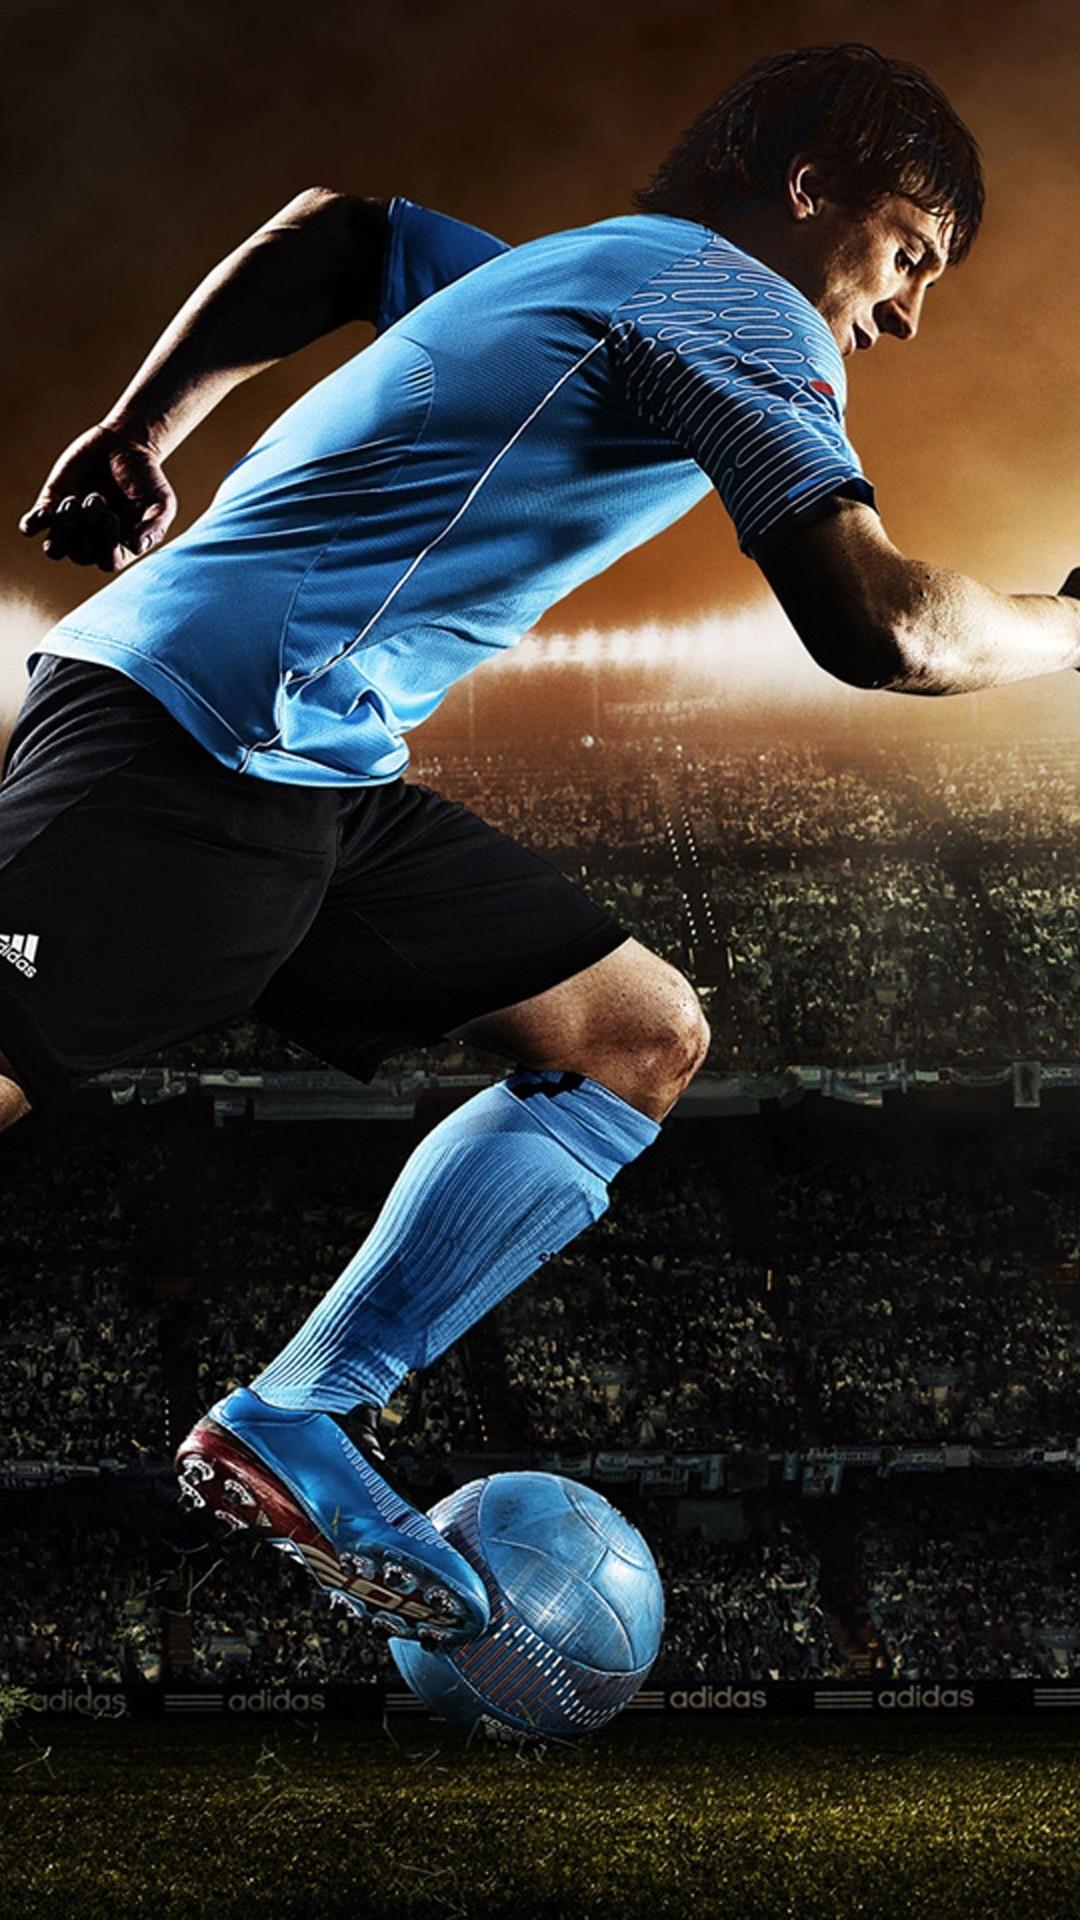 Cool Soccer iPhone 5 wallpaper